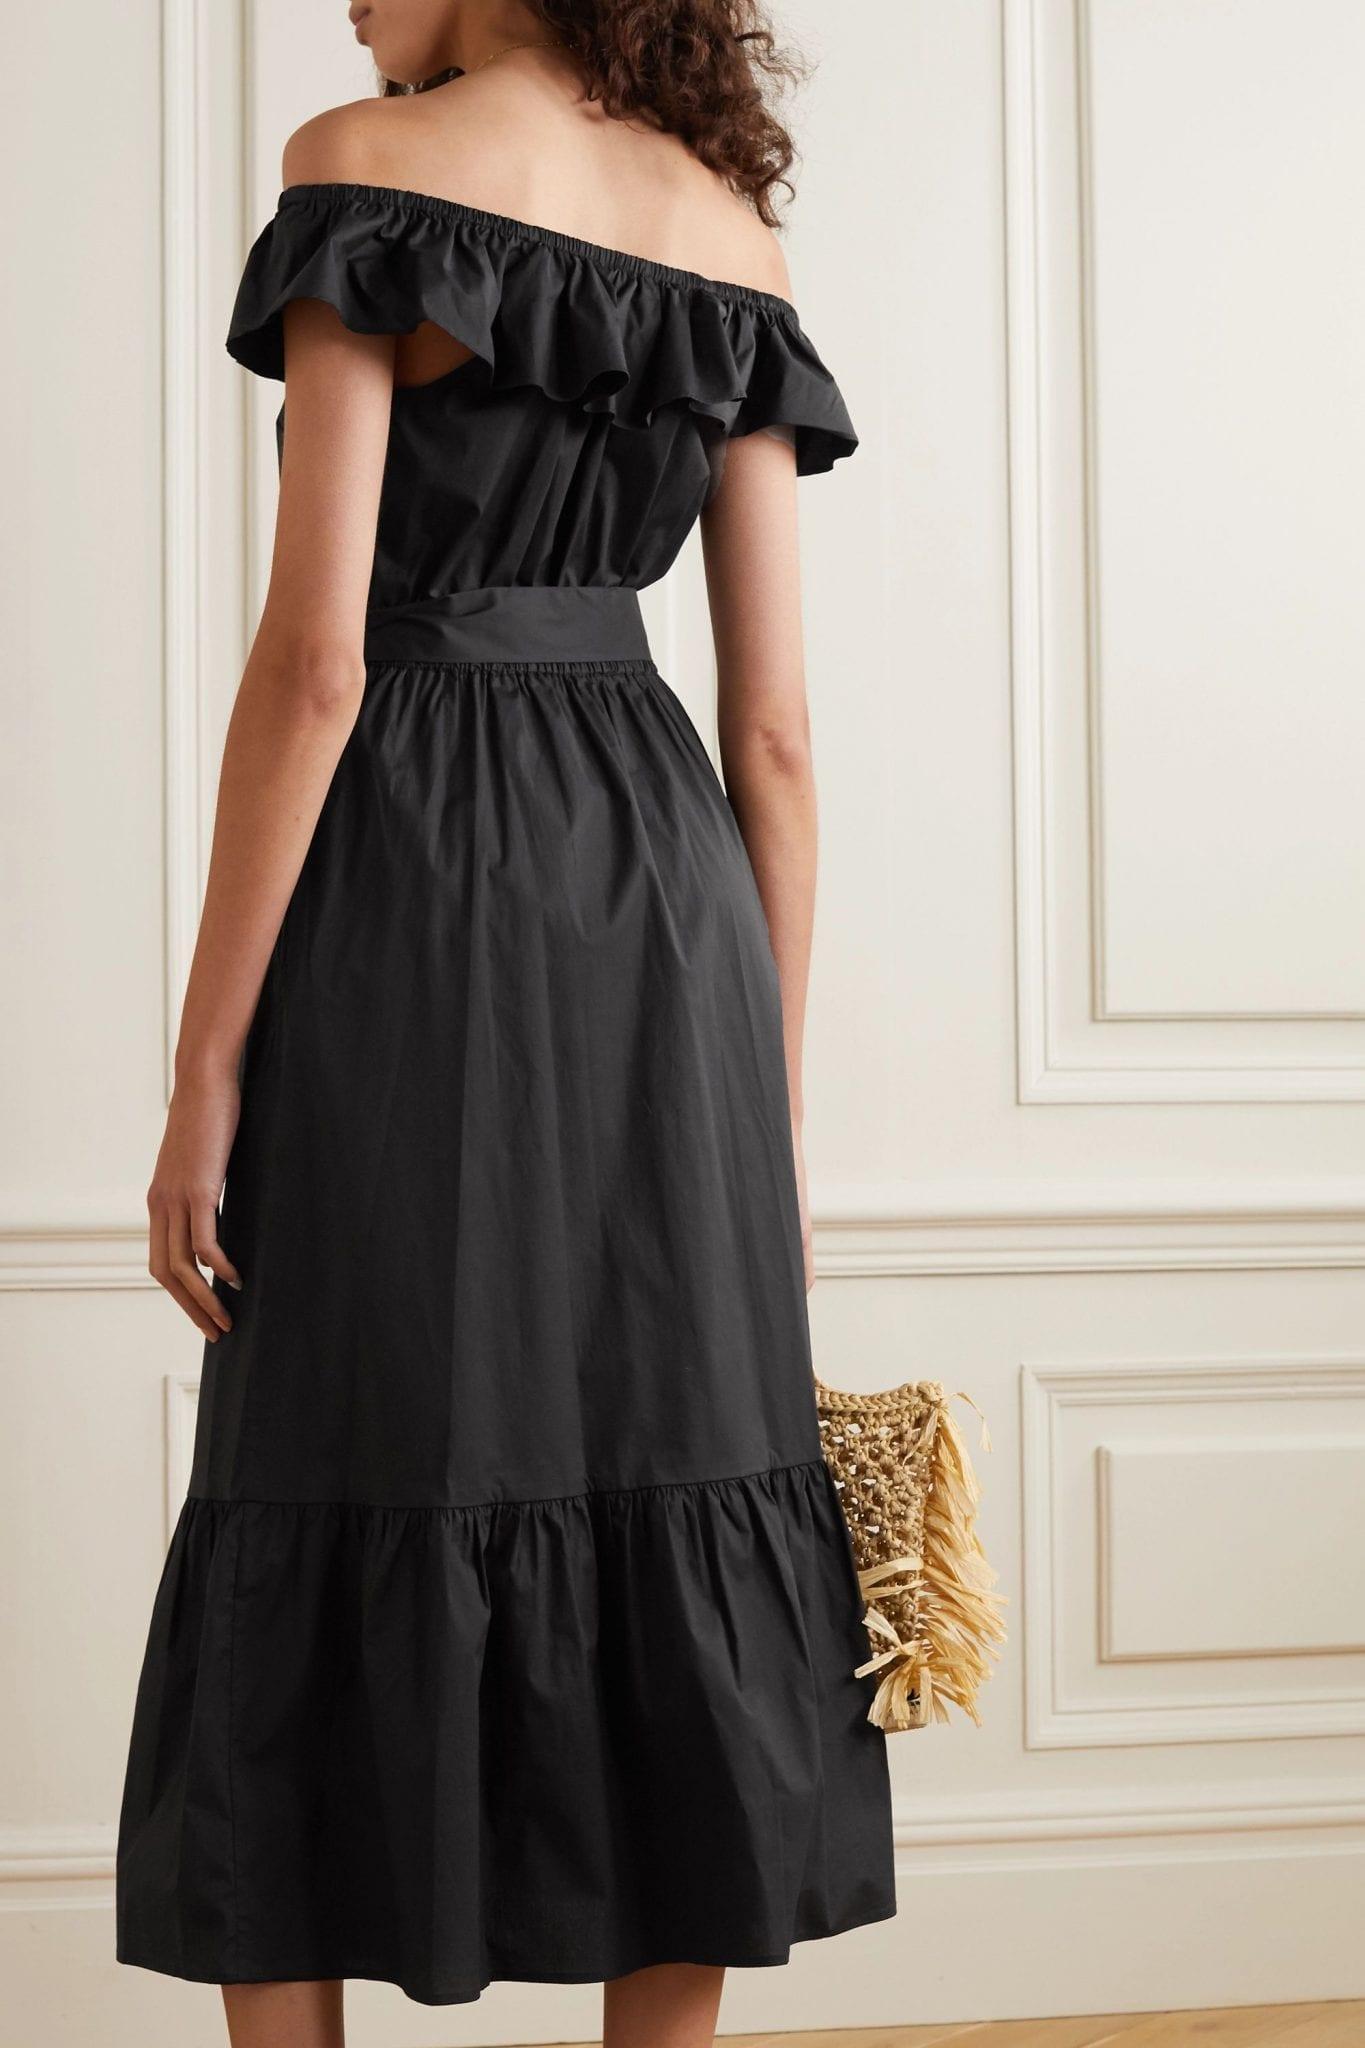 Michael Kors Womens Black Sleeveless Short Body Con Party